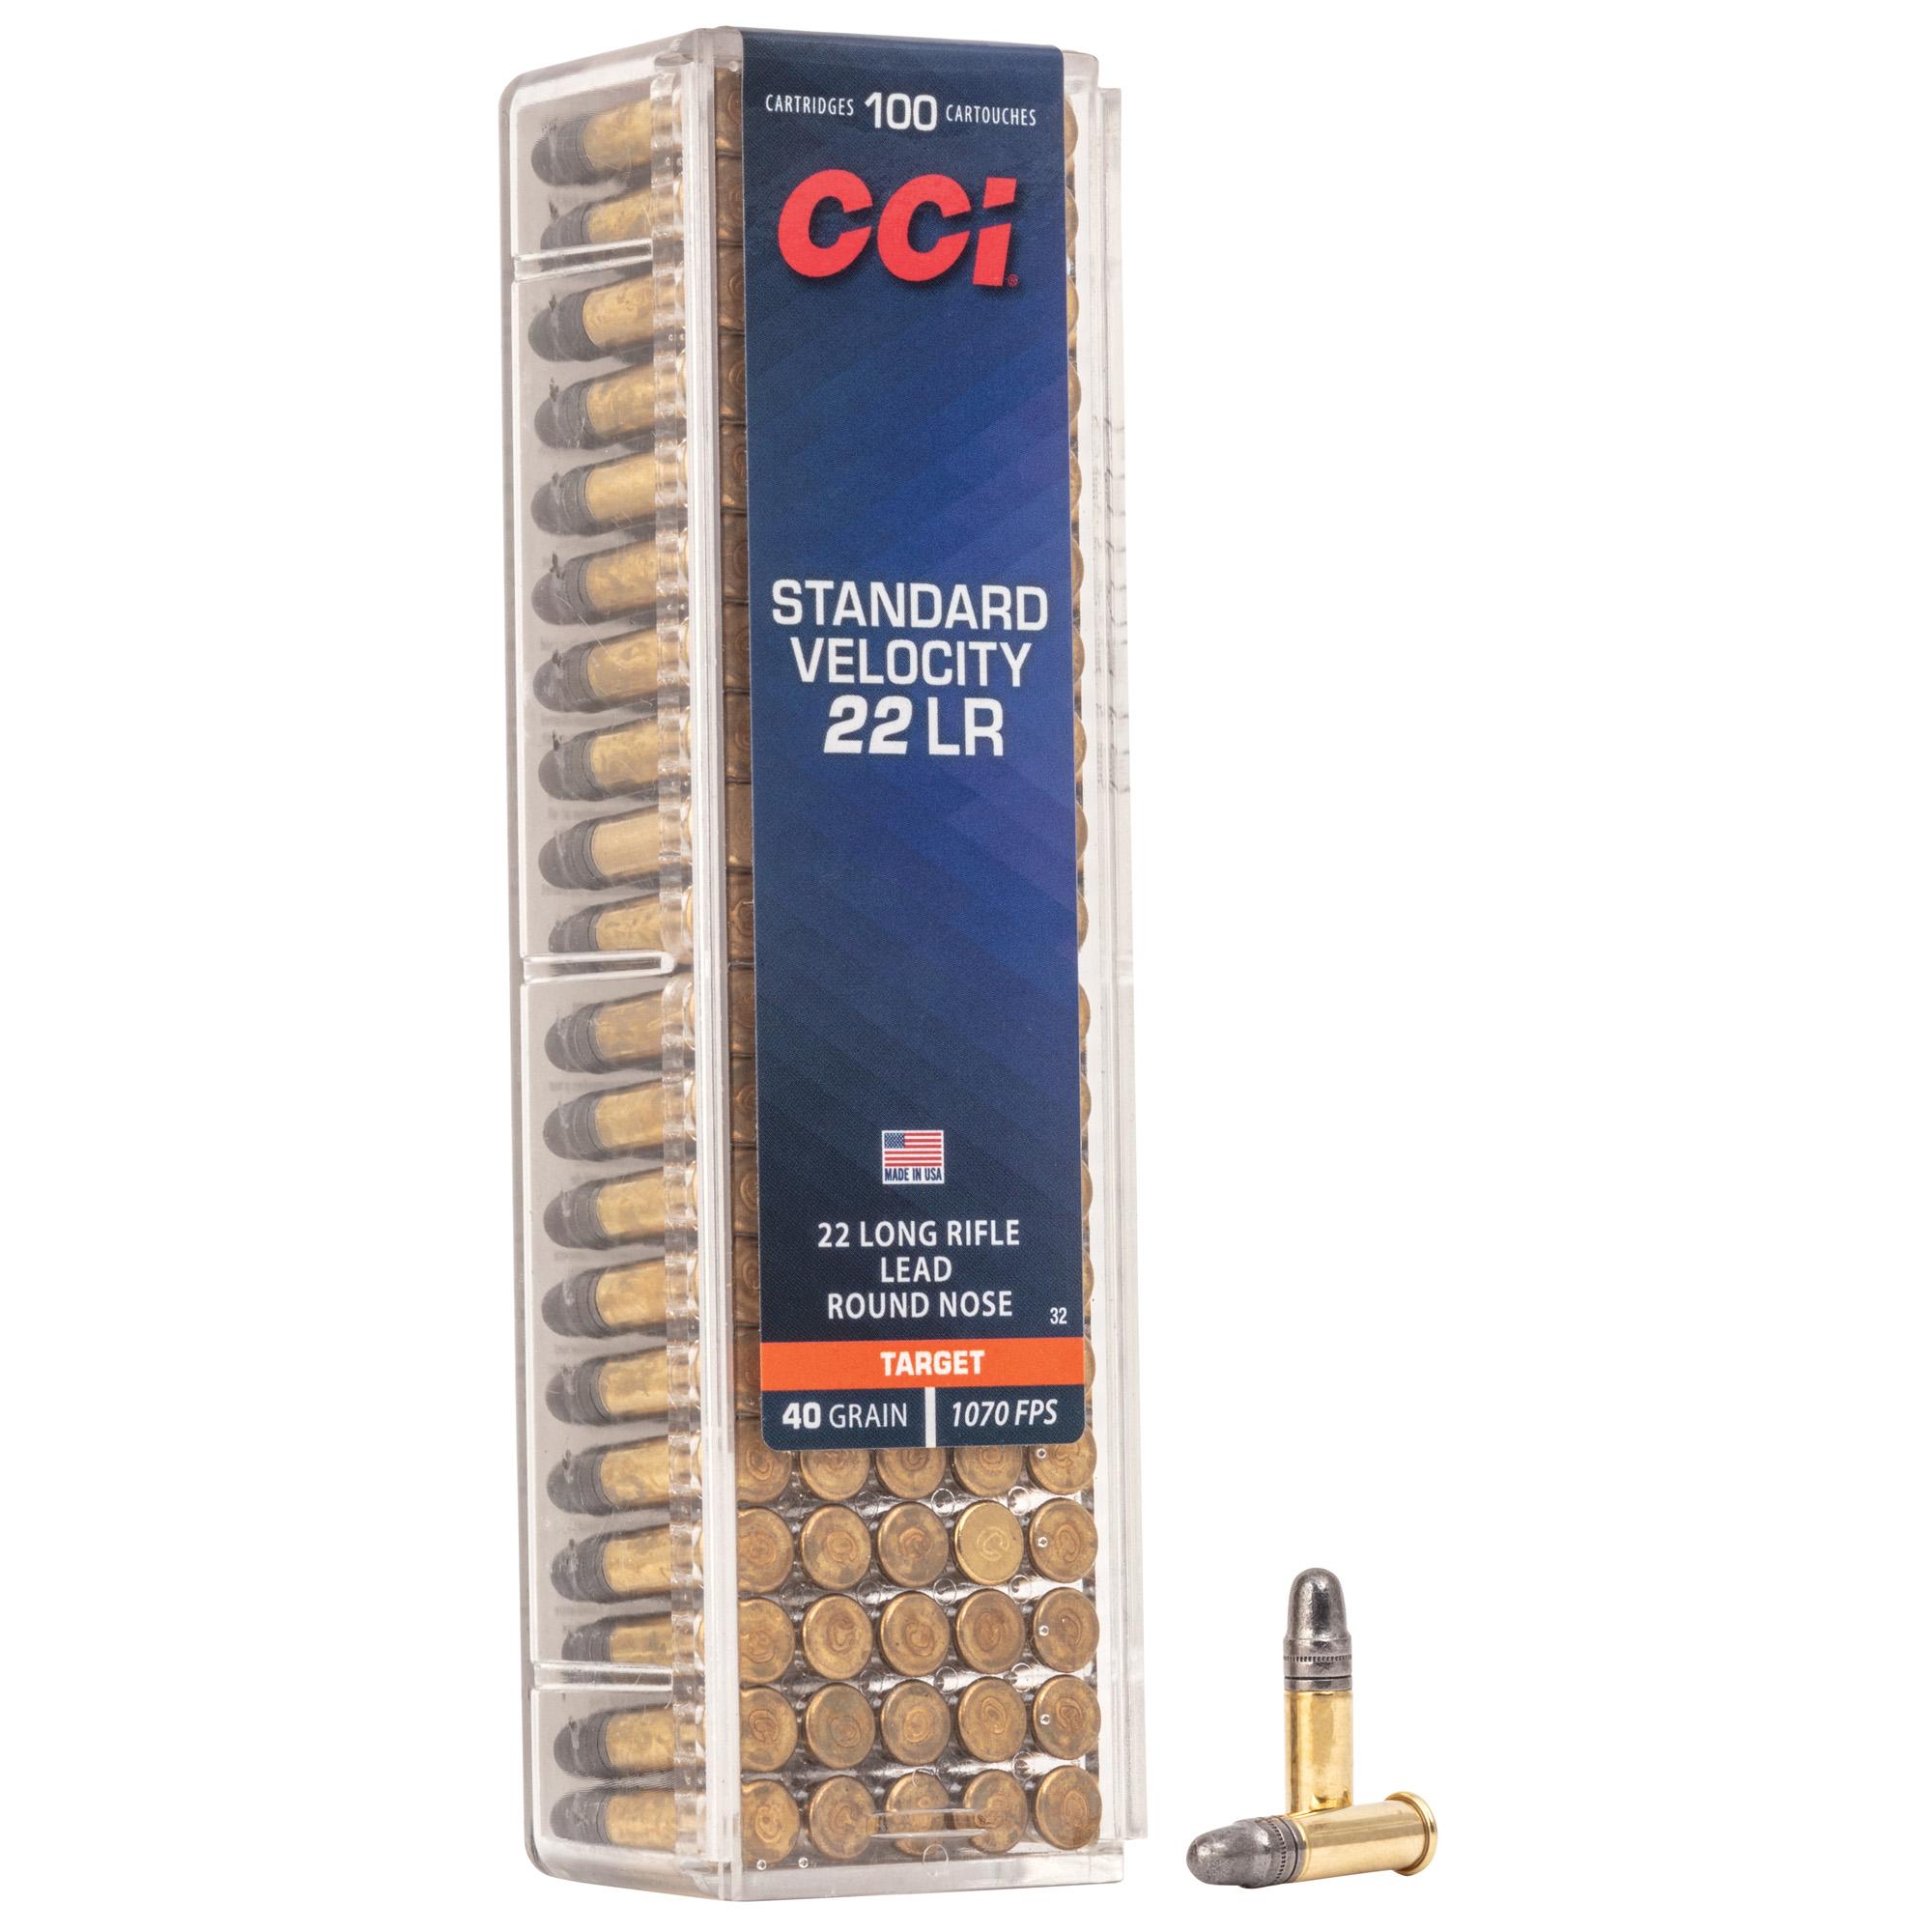 Cci 22lr Standard Velocity 100/5000